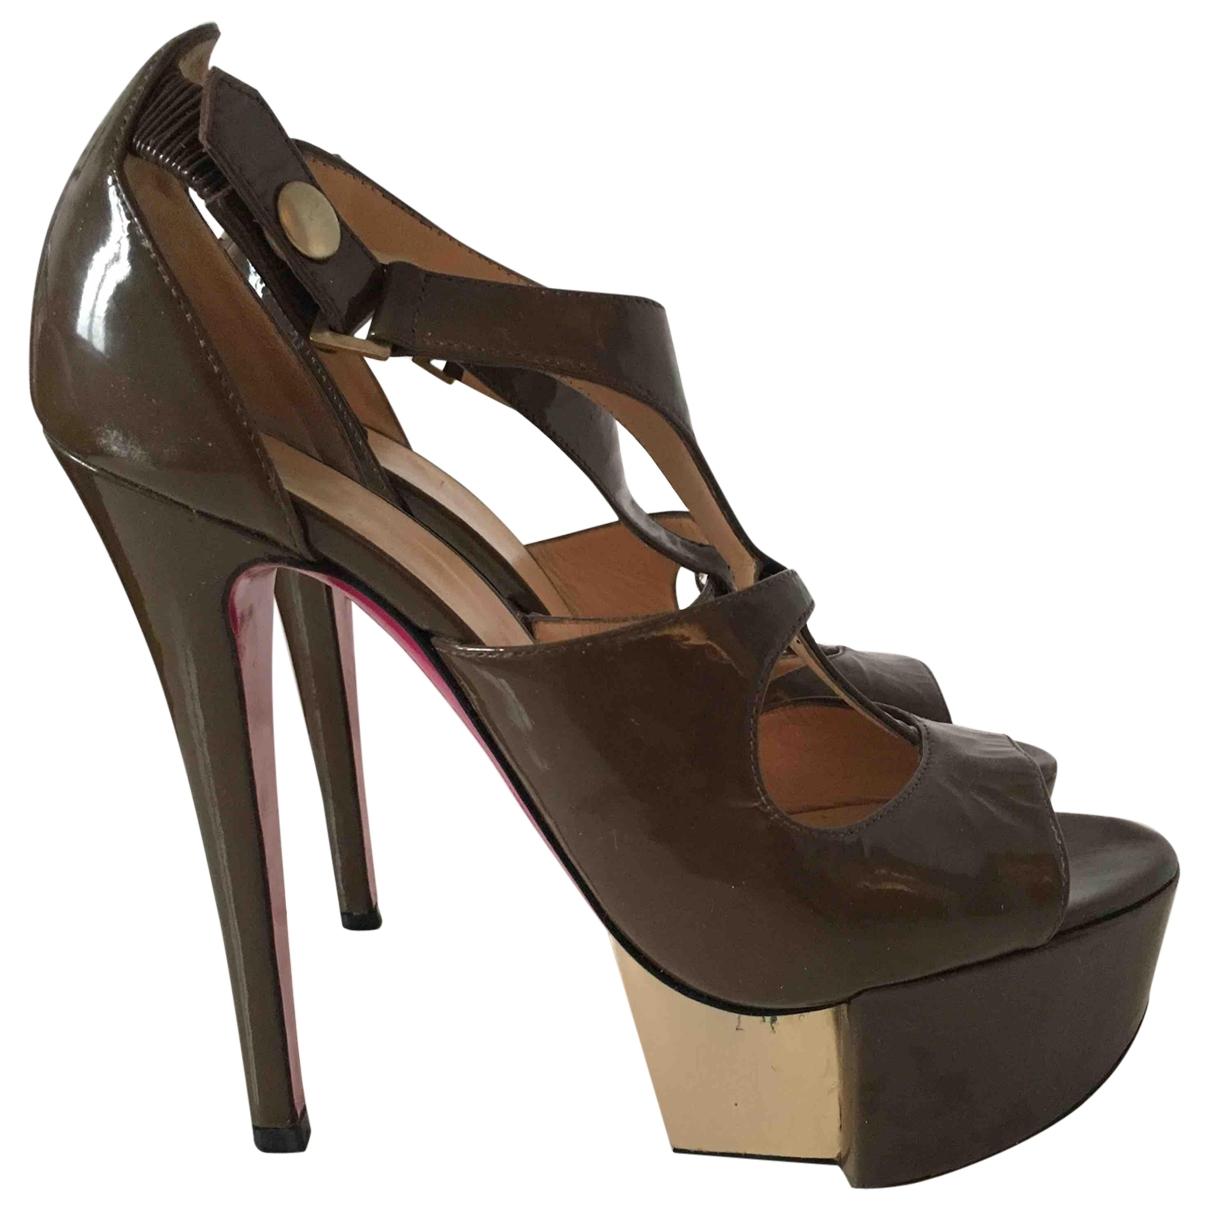 Versace \N Brown Patent leather Heels for Women 37 EU